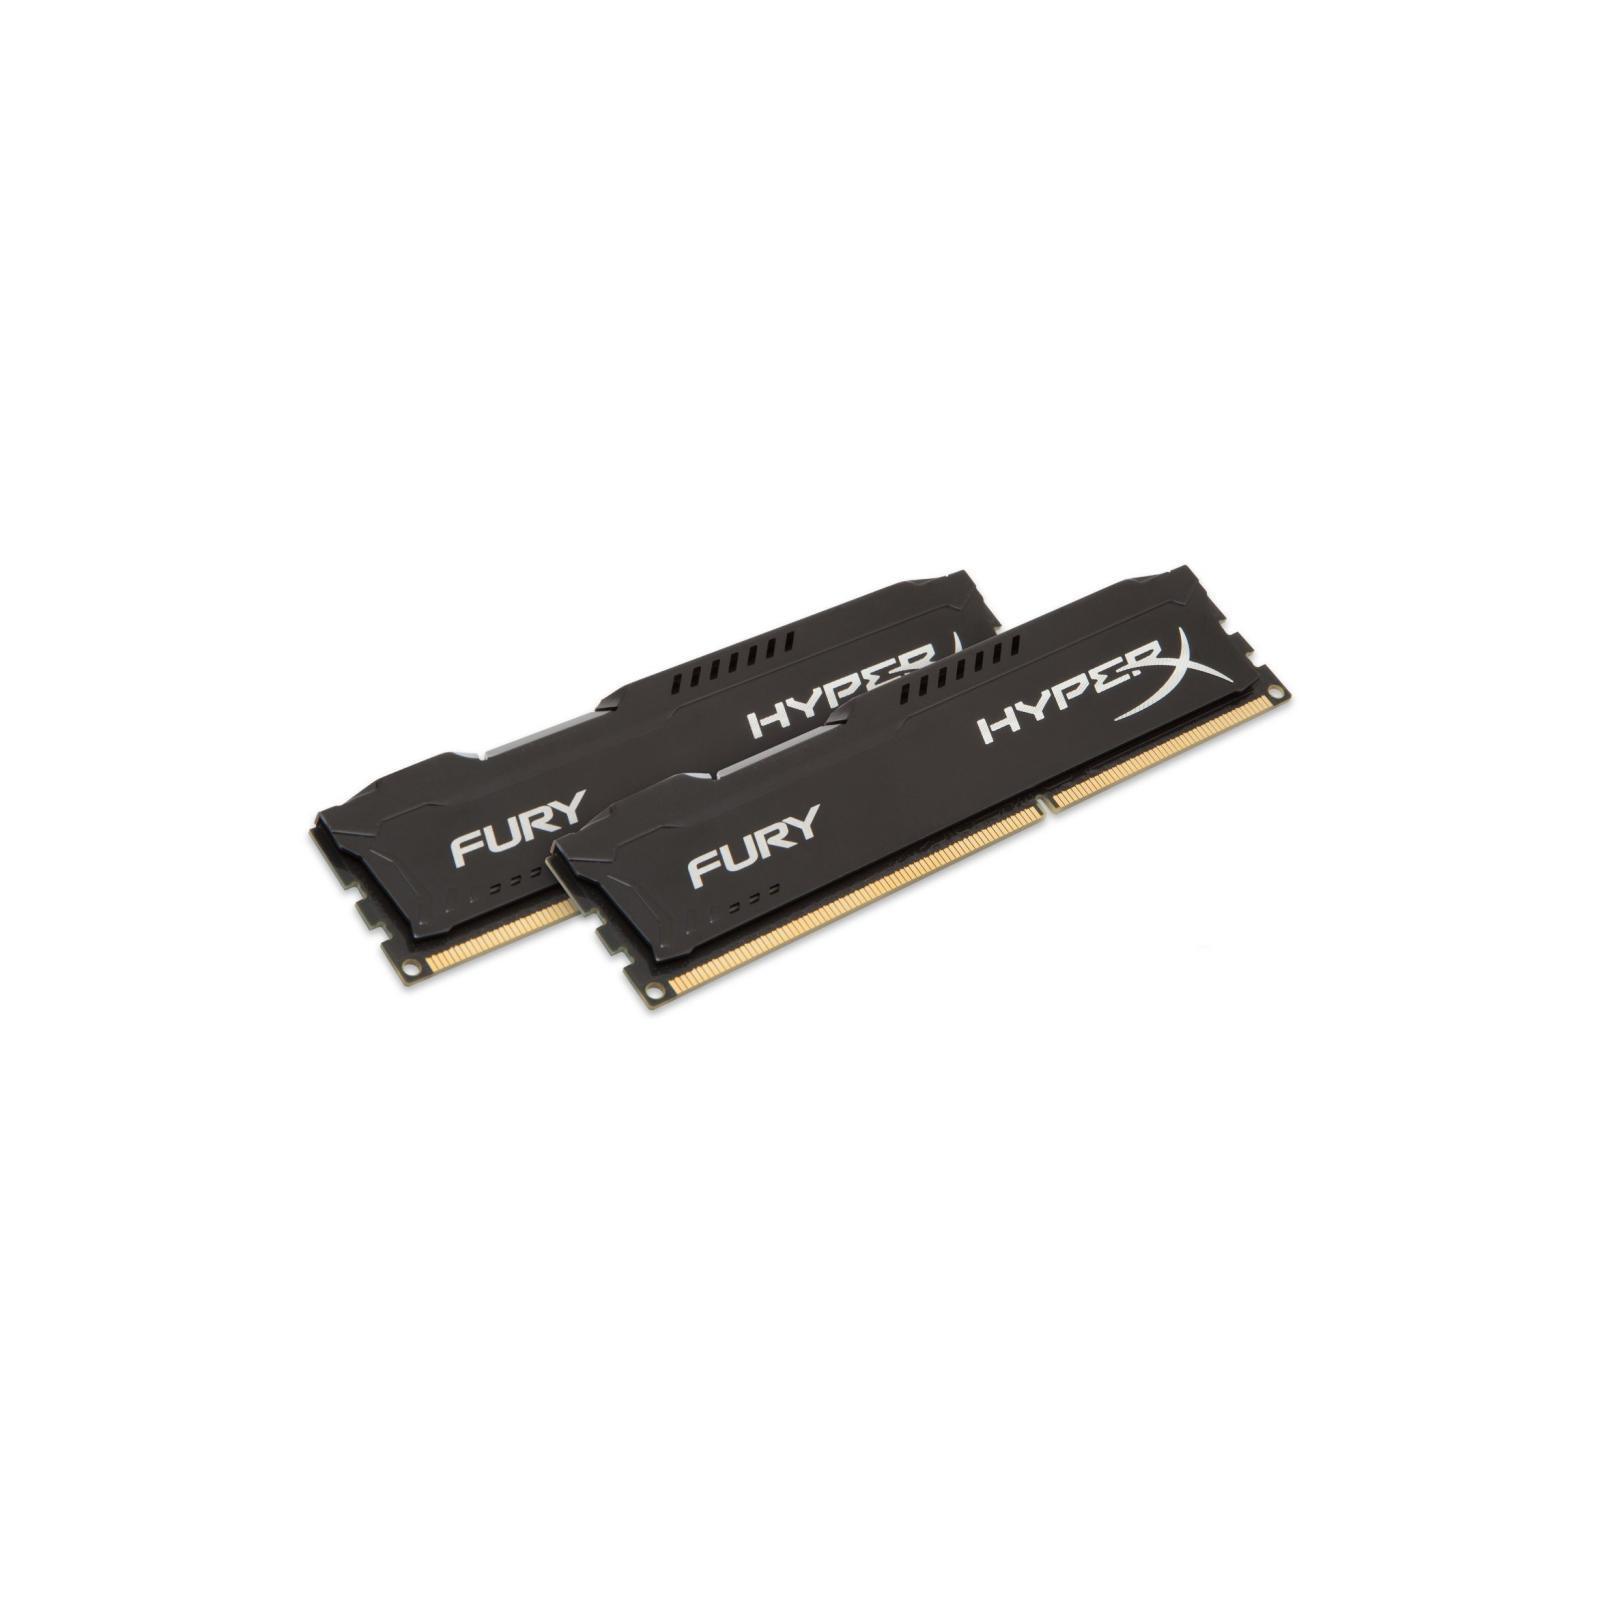 Модуль памяти для компьютера DDR4 16GB (2x8GB) 2933 MHz HyperX FURY Black HyperX (Kingston Fury) (HX429C17FB2K2/16) изображение 2